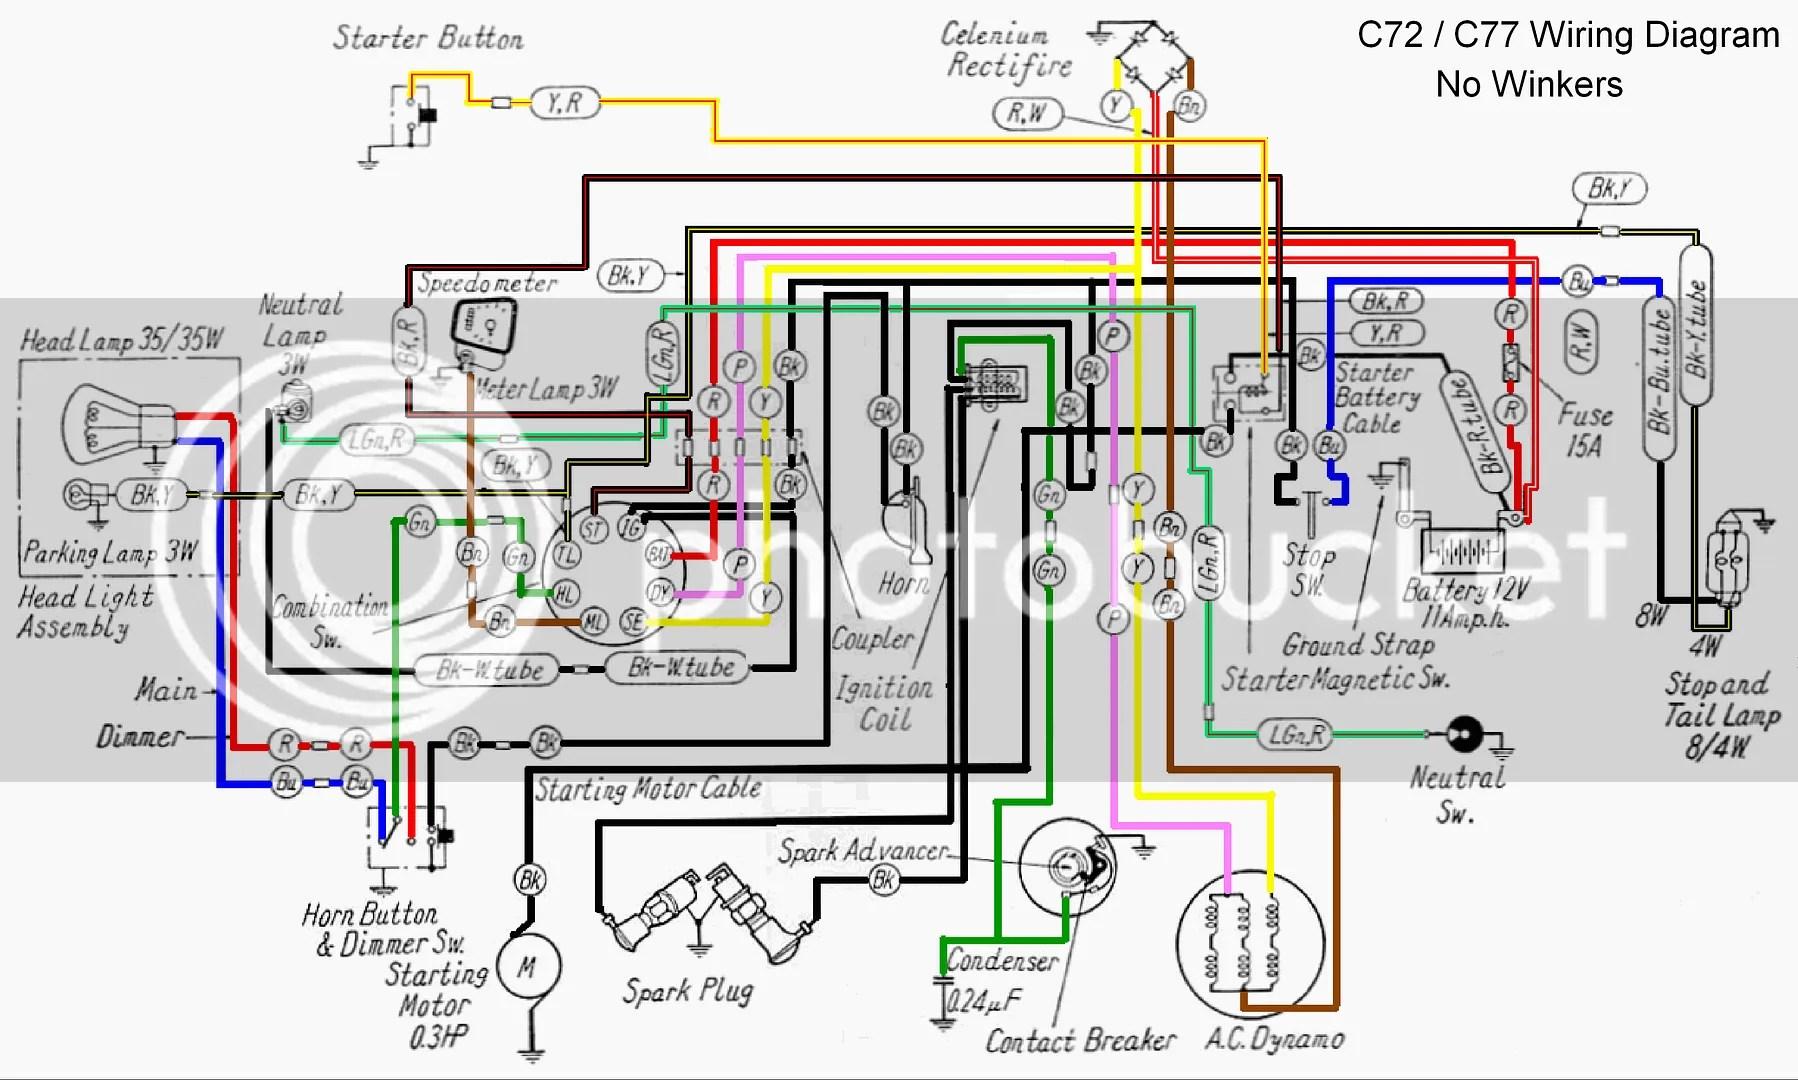 hight resolution of vacuum line diagram ford truck club forum caroldoey wiring diagram dat how to wire dayton barrel